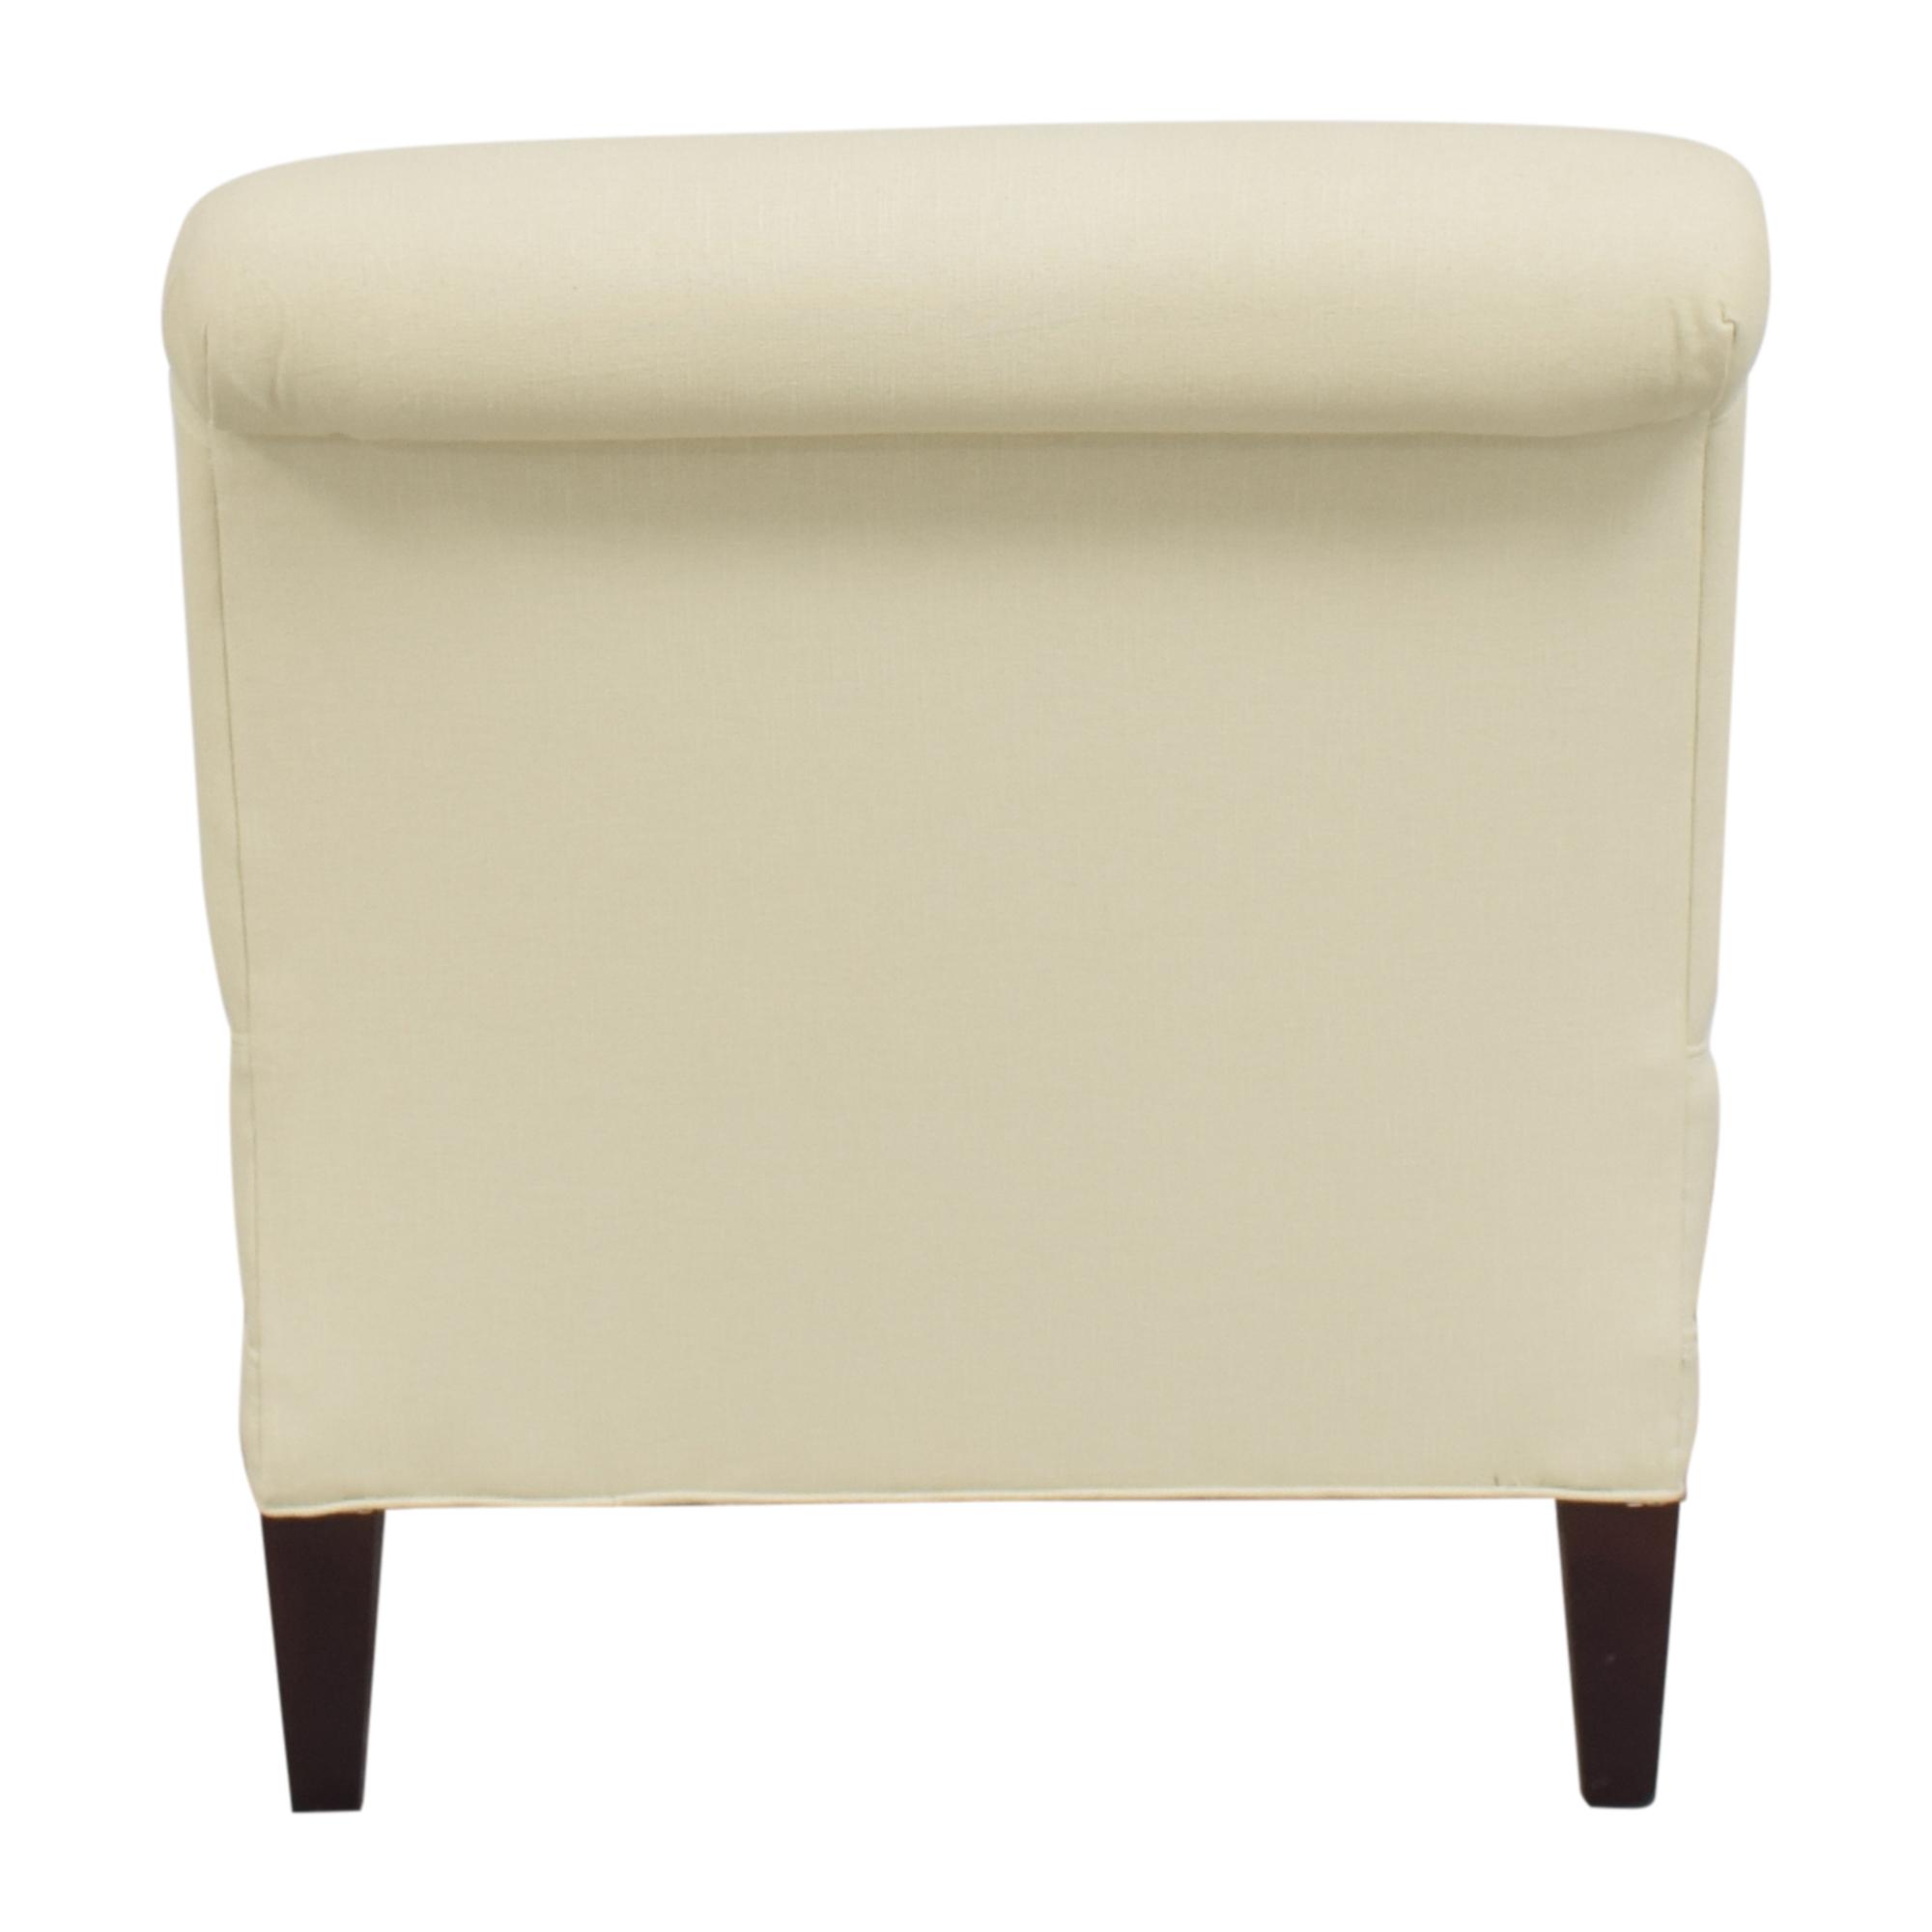 Crate & Barrel Crate & Barrel Pierre Slipper Chair Accent Chairs